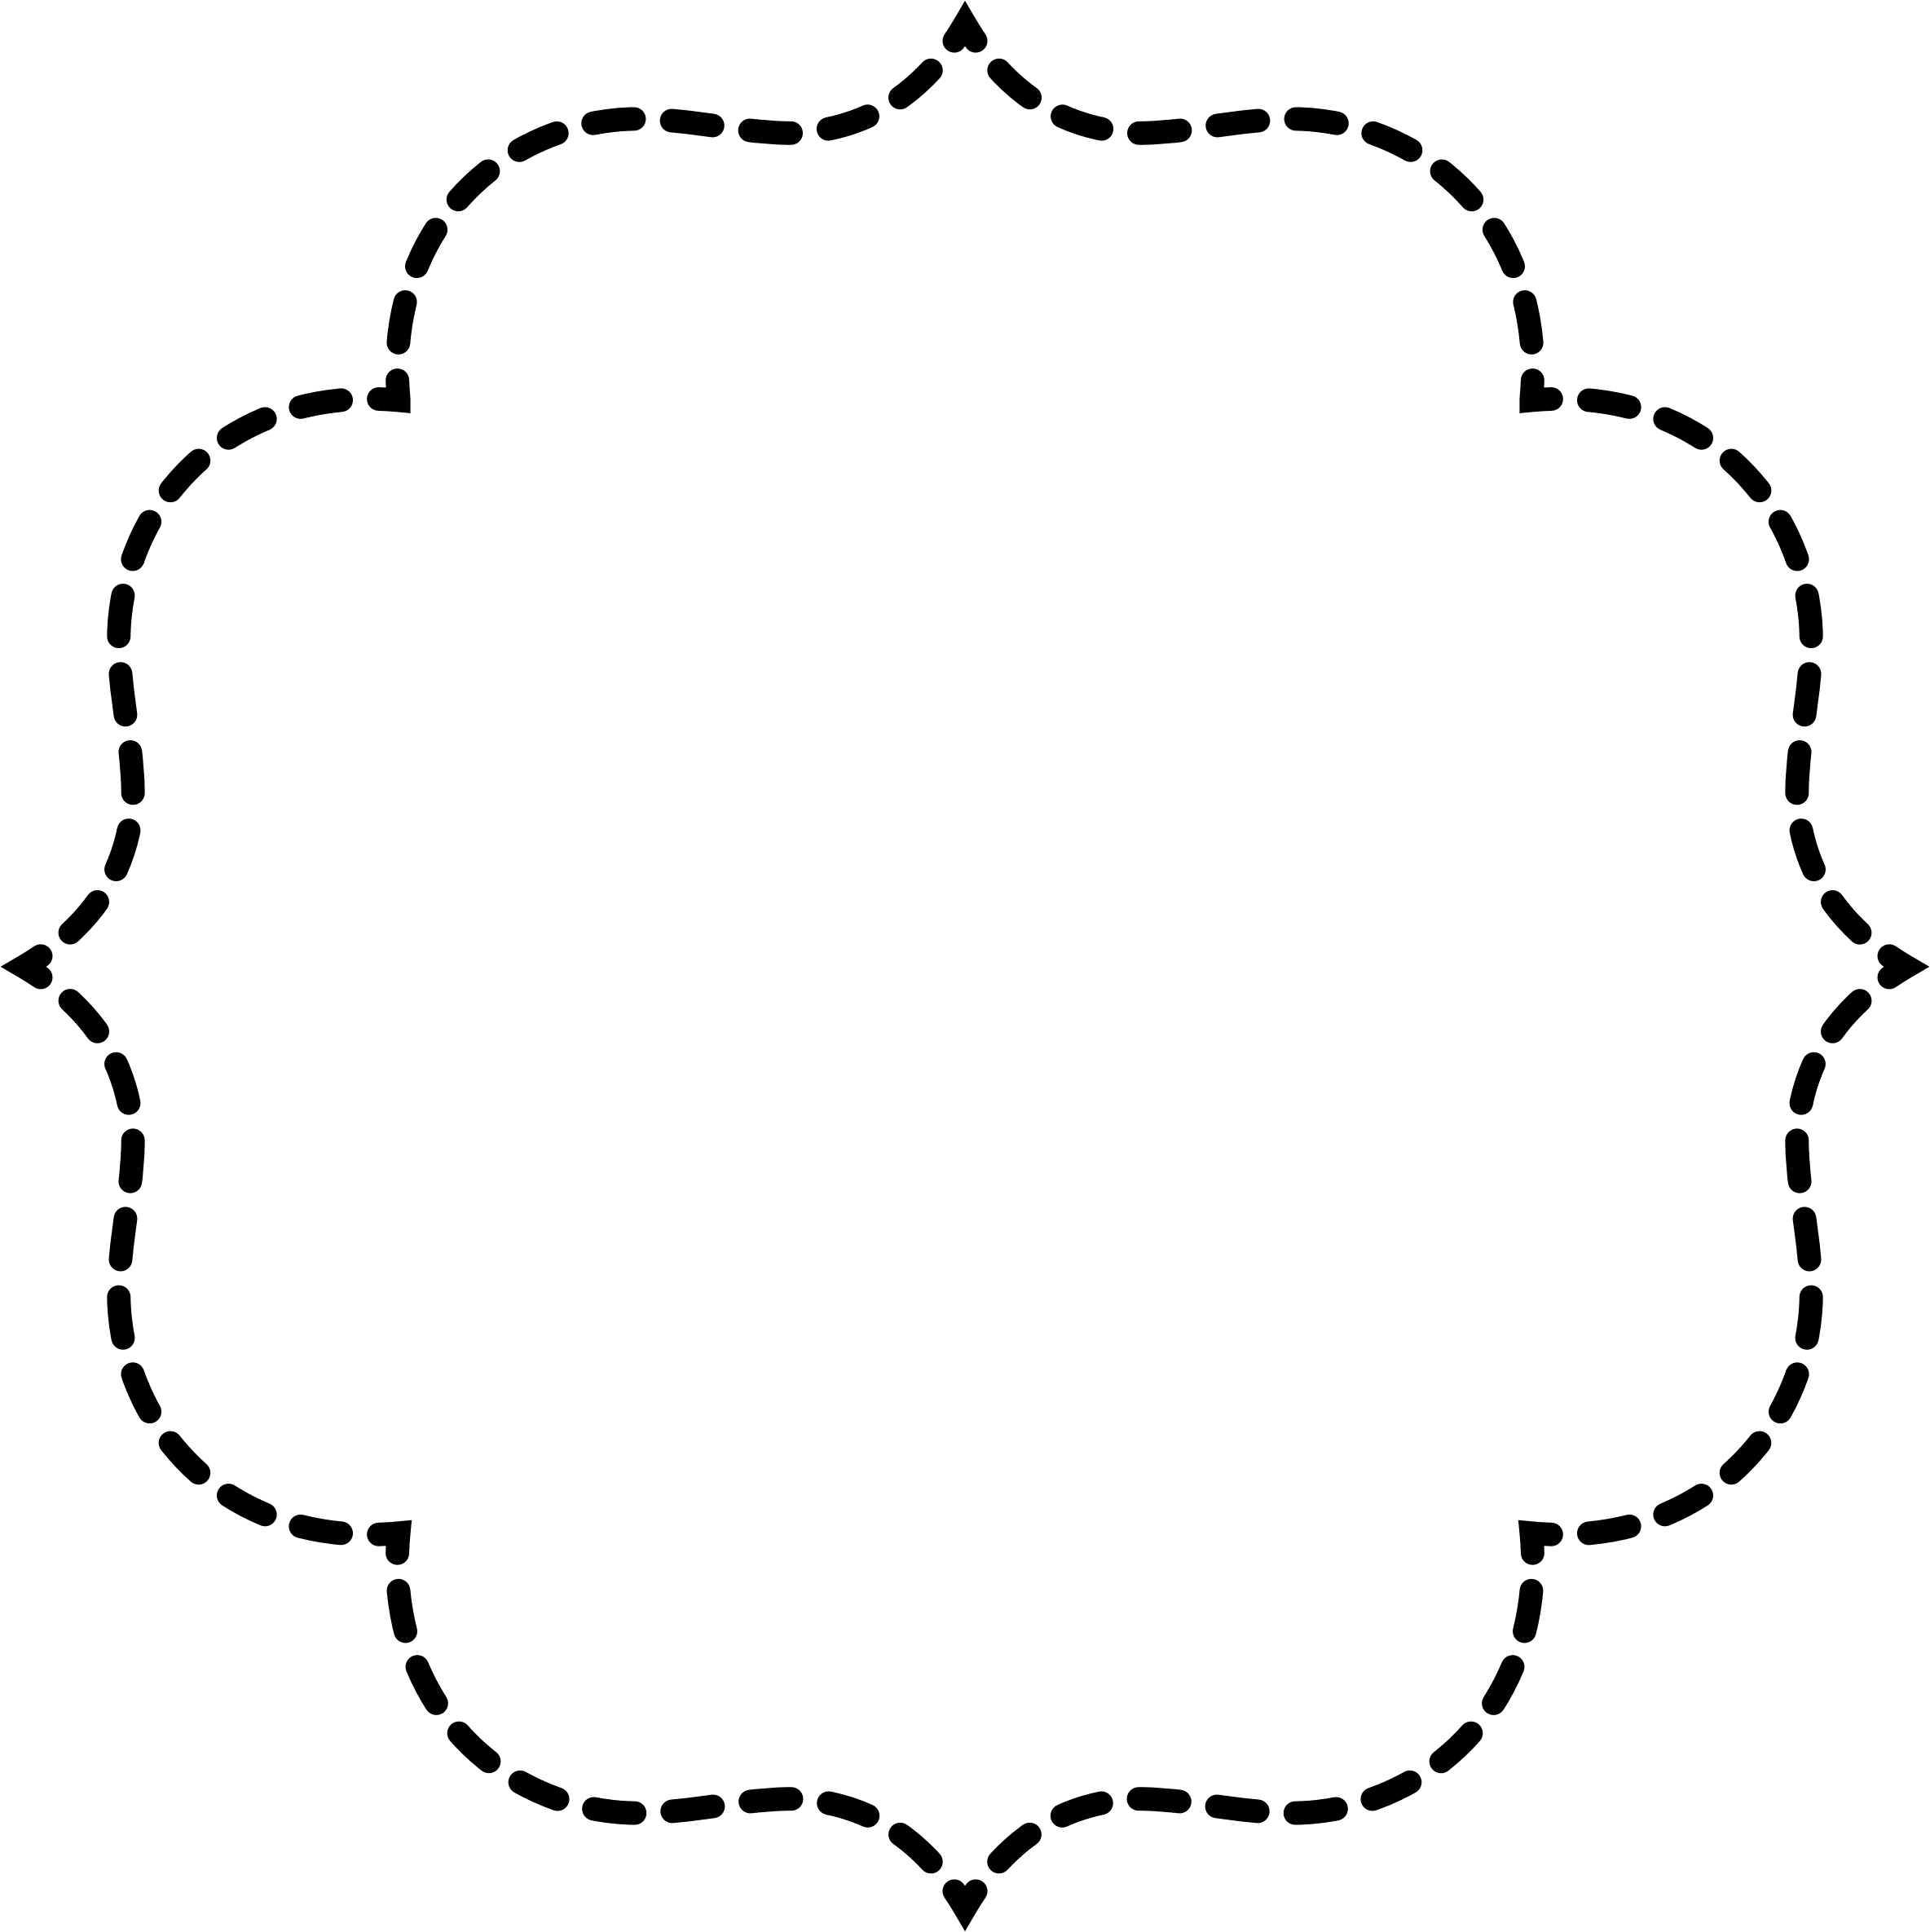 Shape PNG - 25291